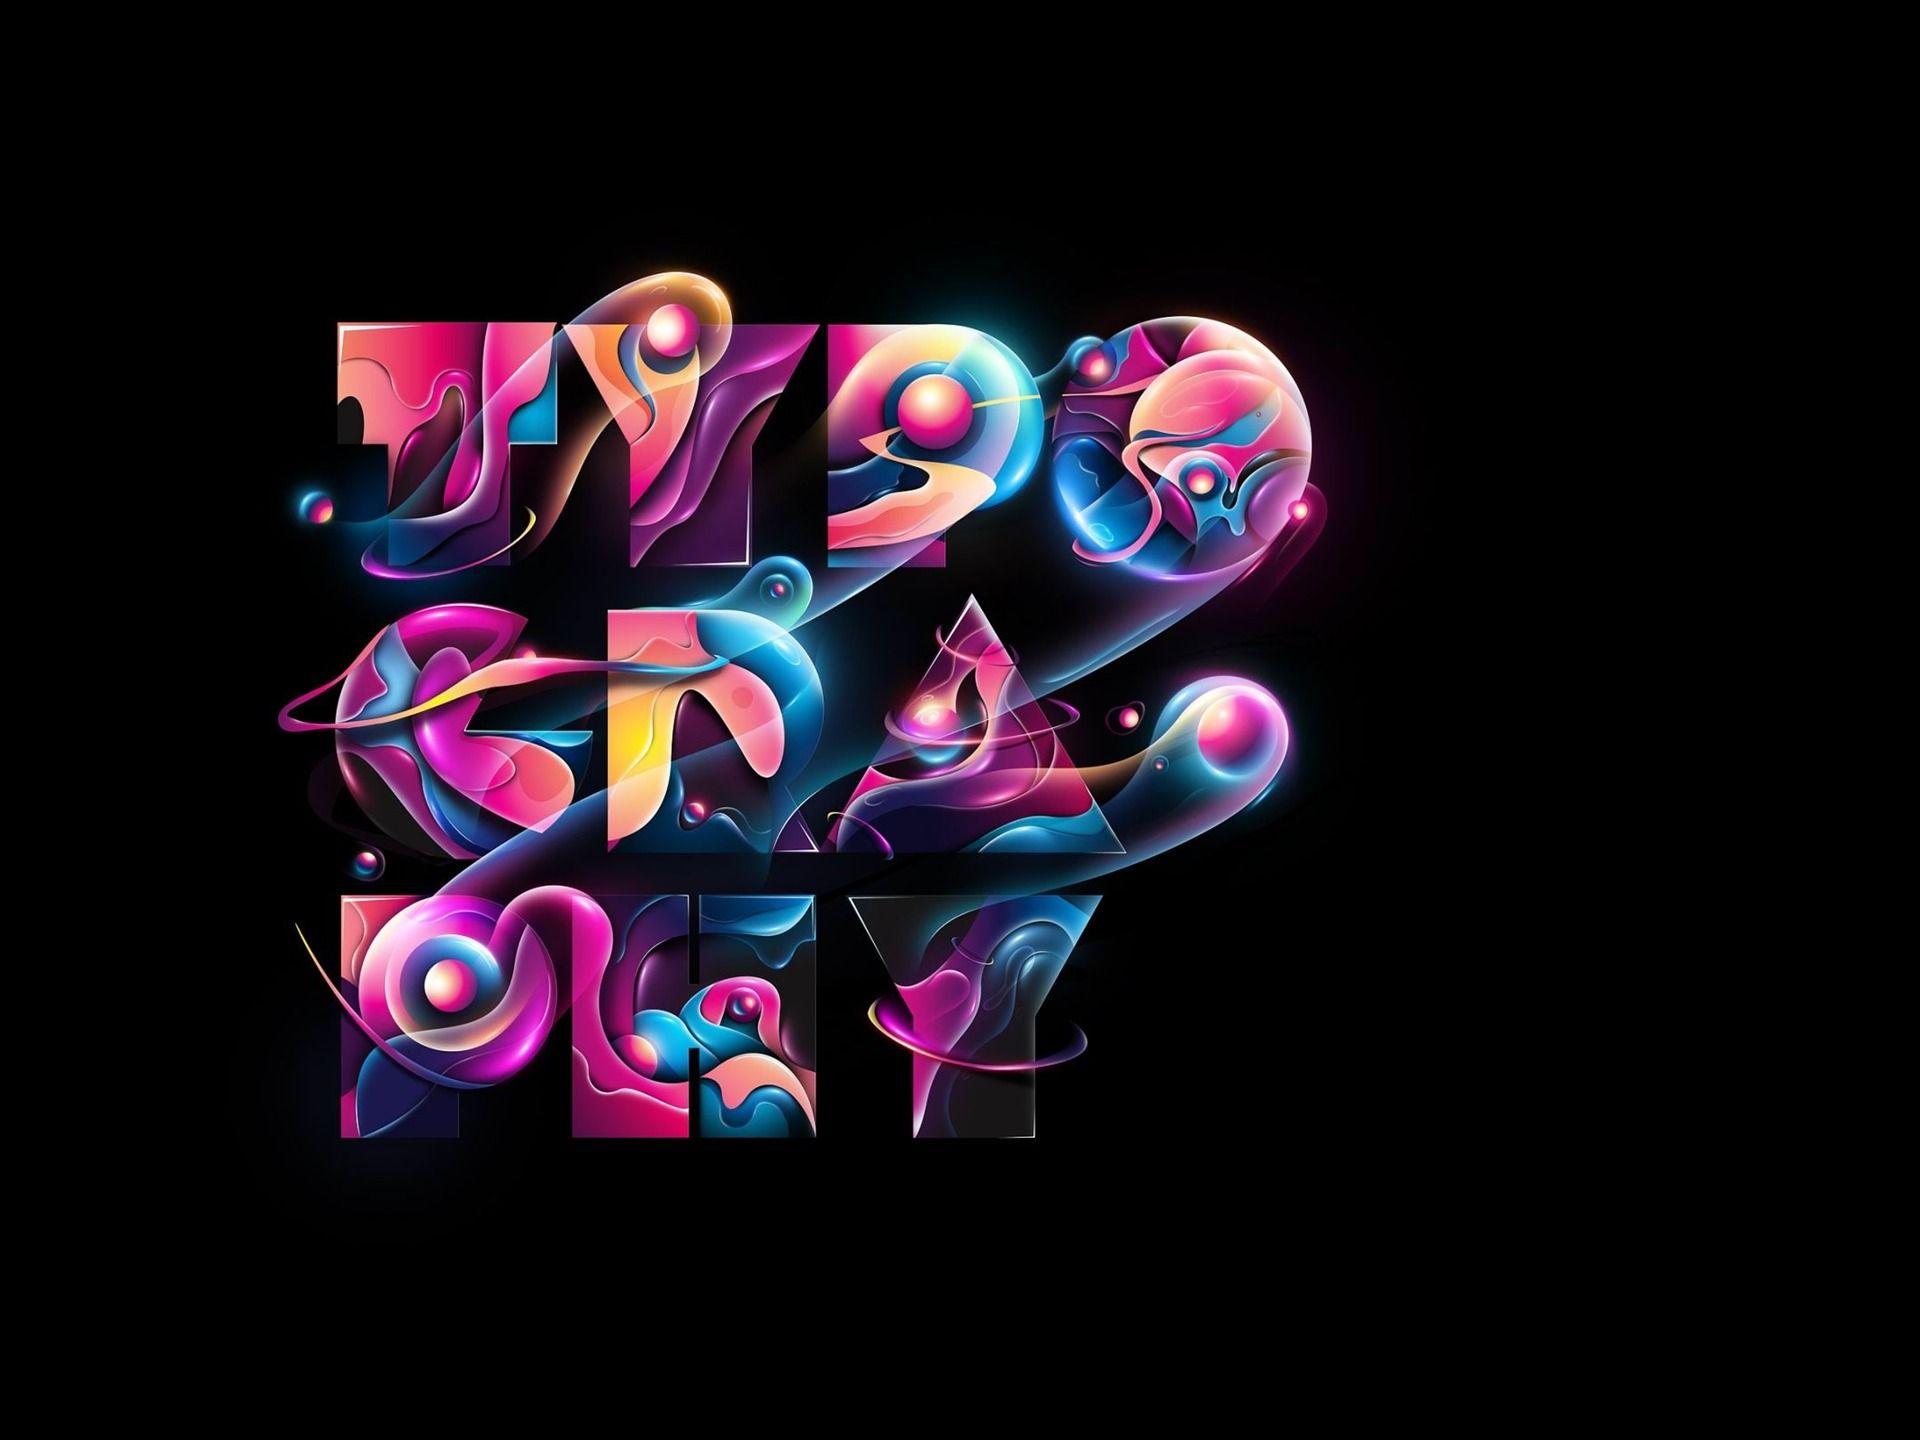 Graphic Design Desktop Wallpaper 6816 Hd Wallpapers